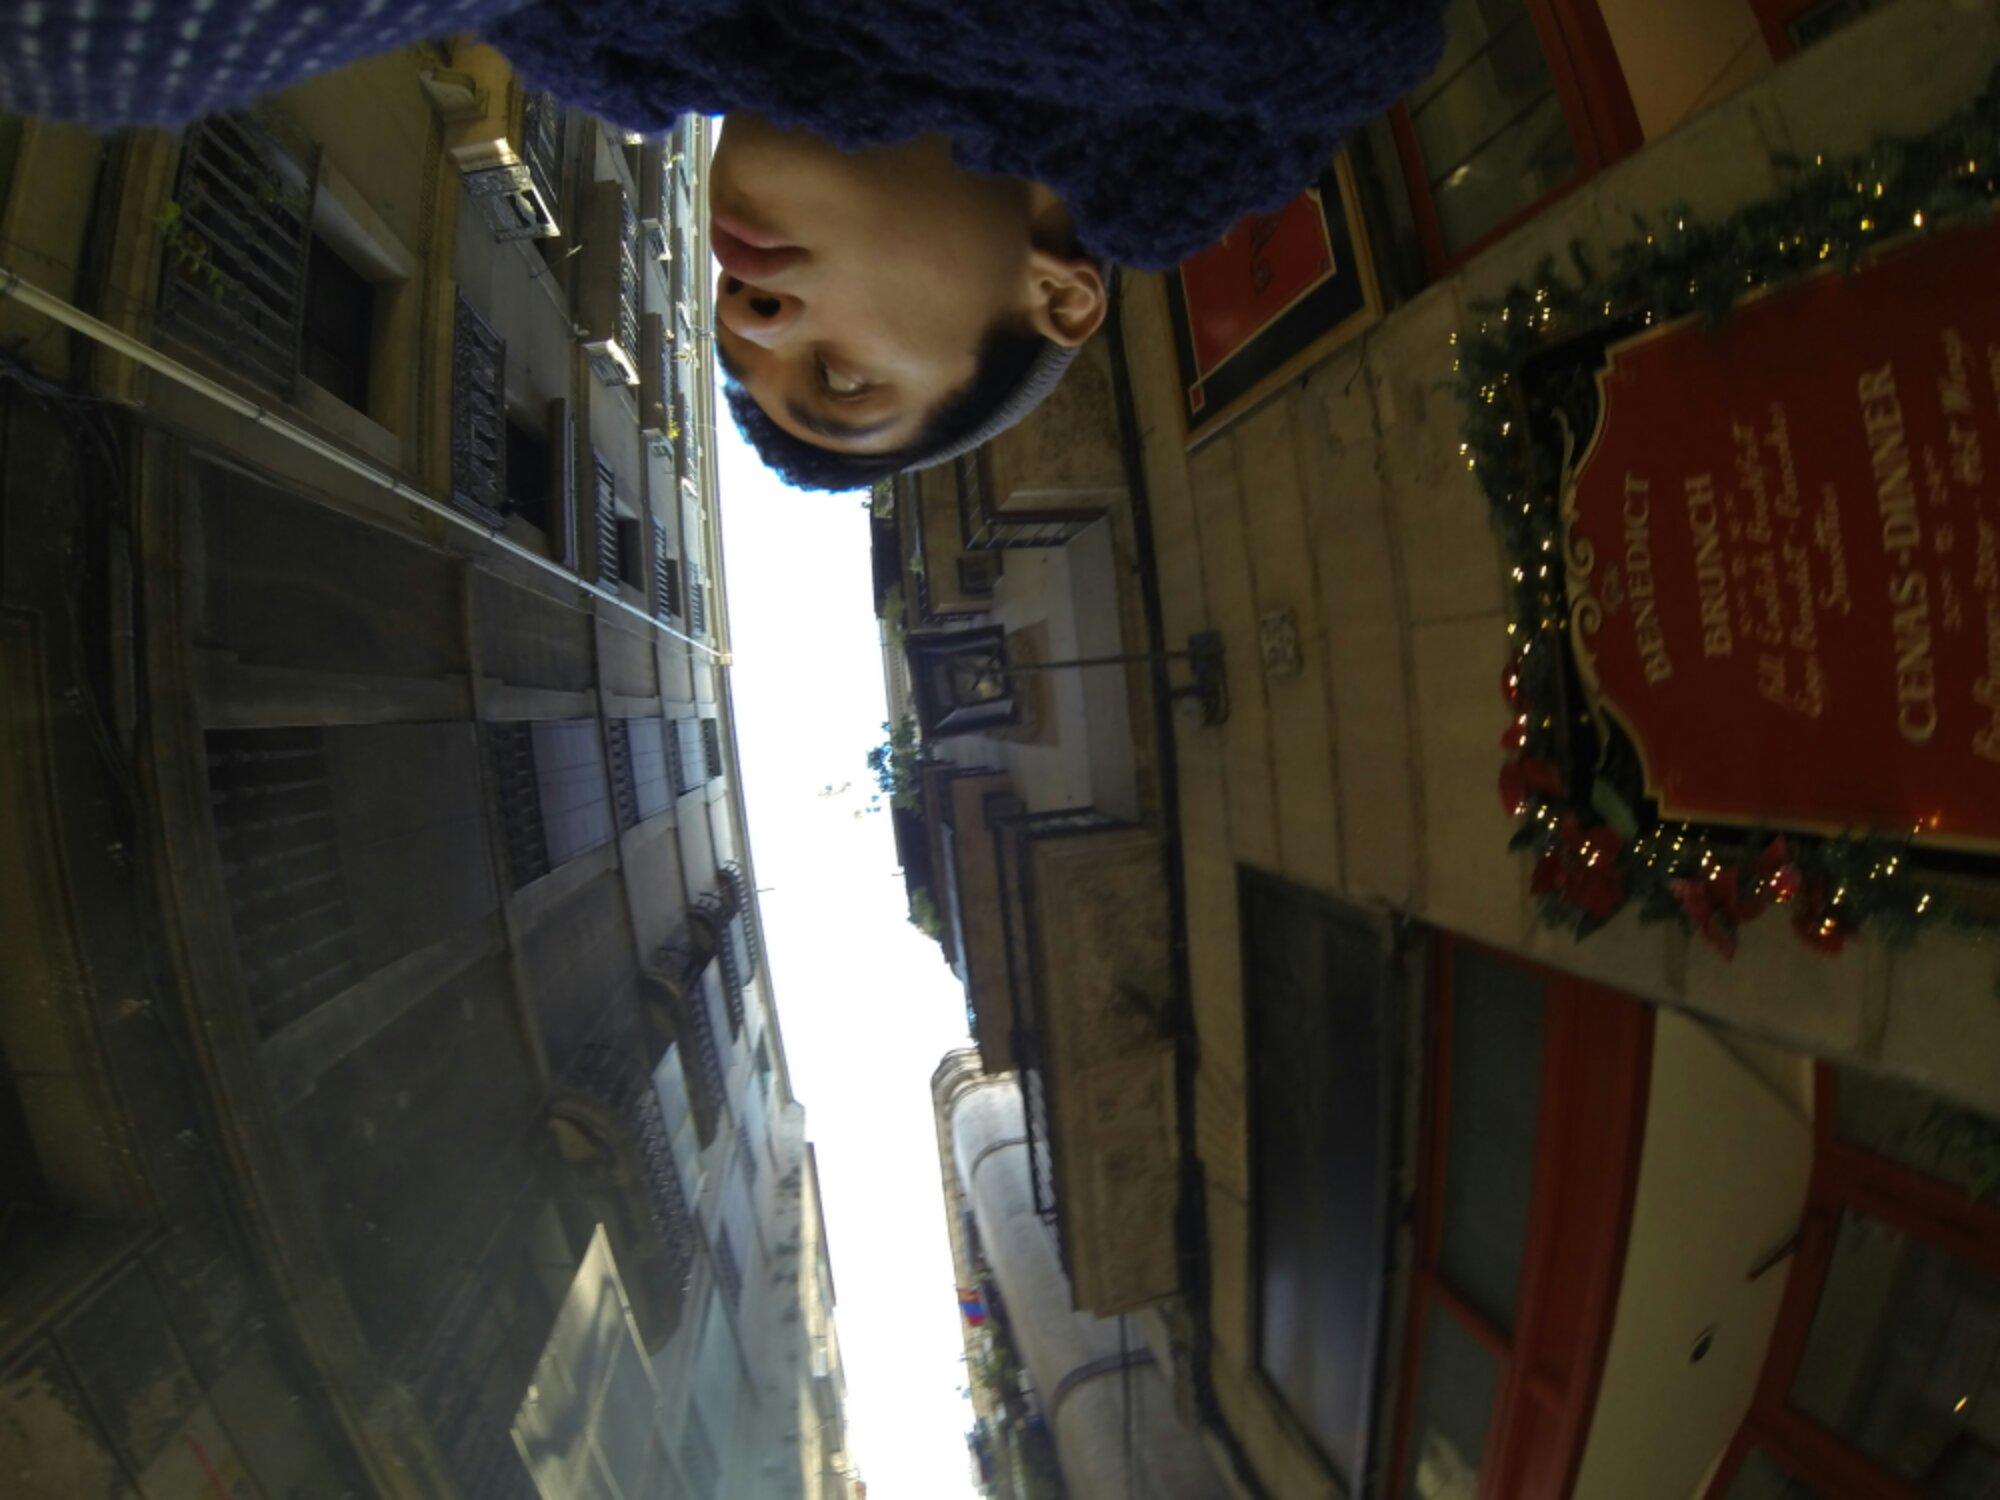 barney stinson high five meme - photo #40